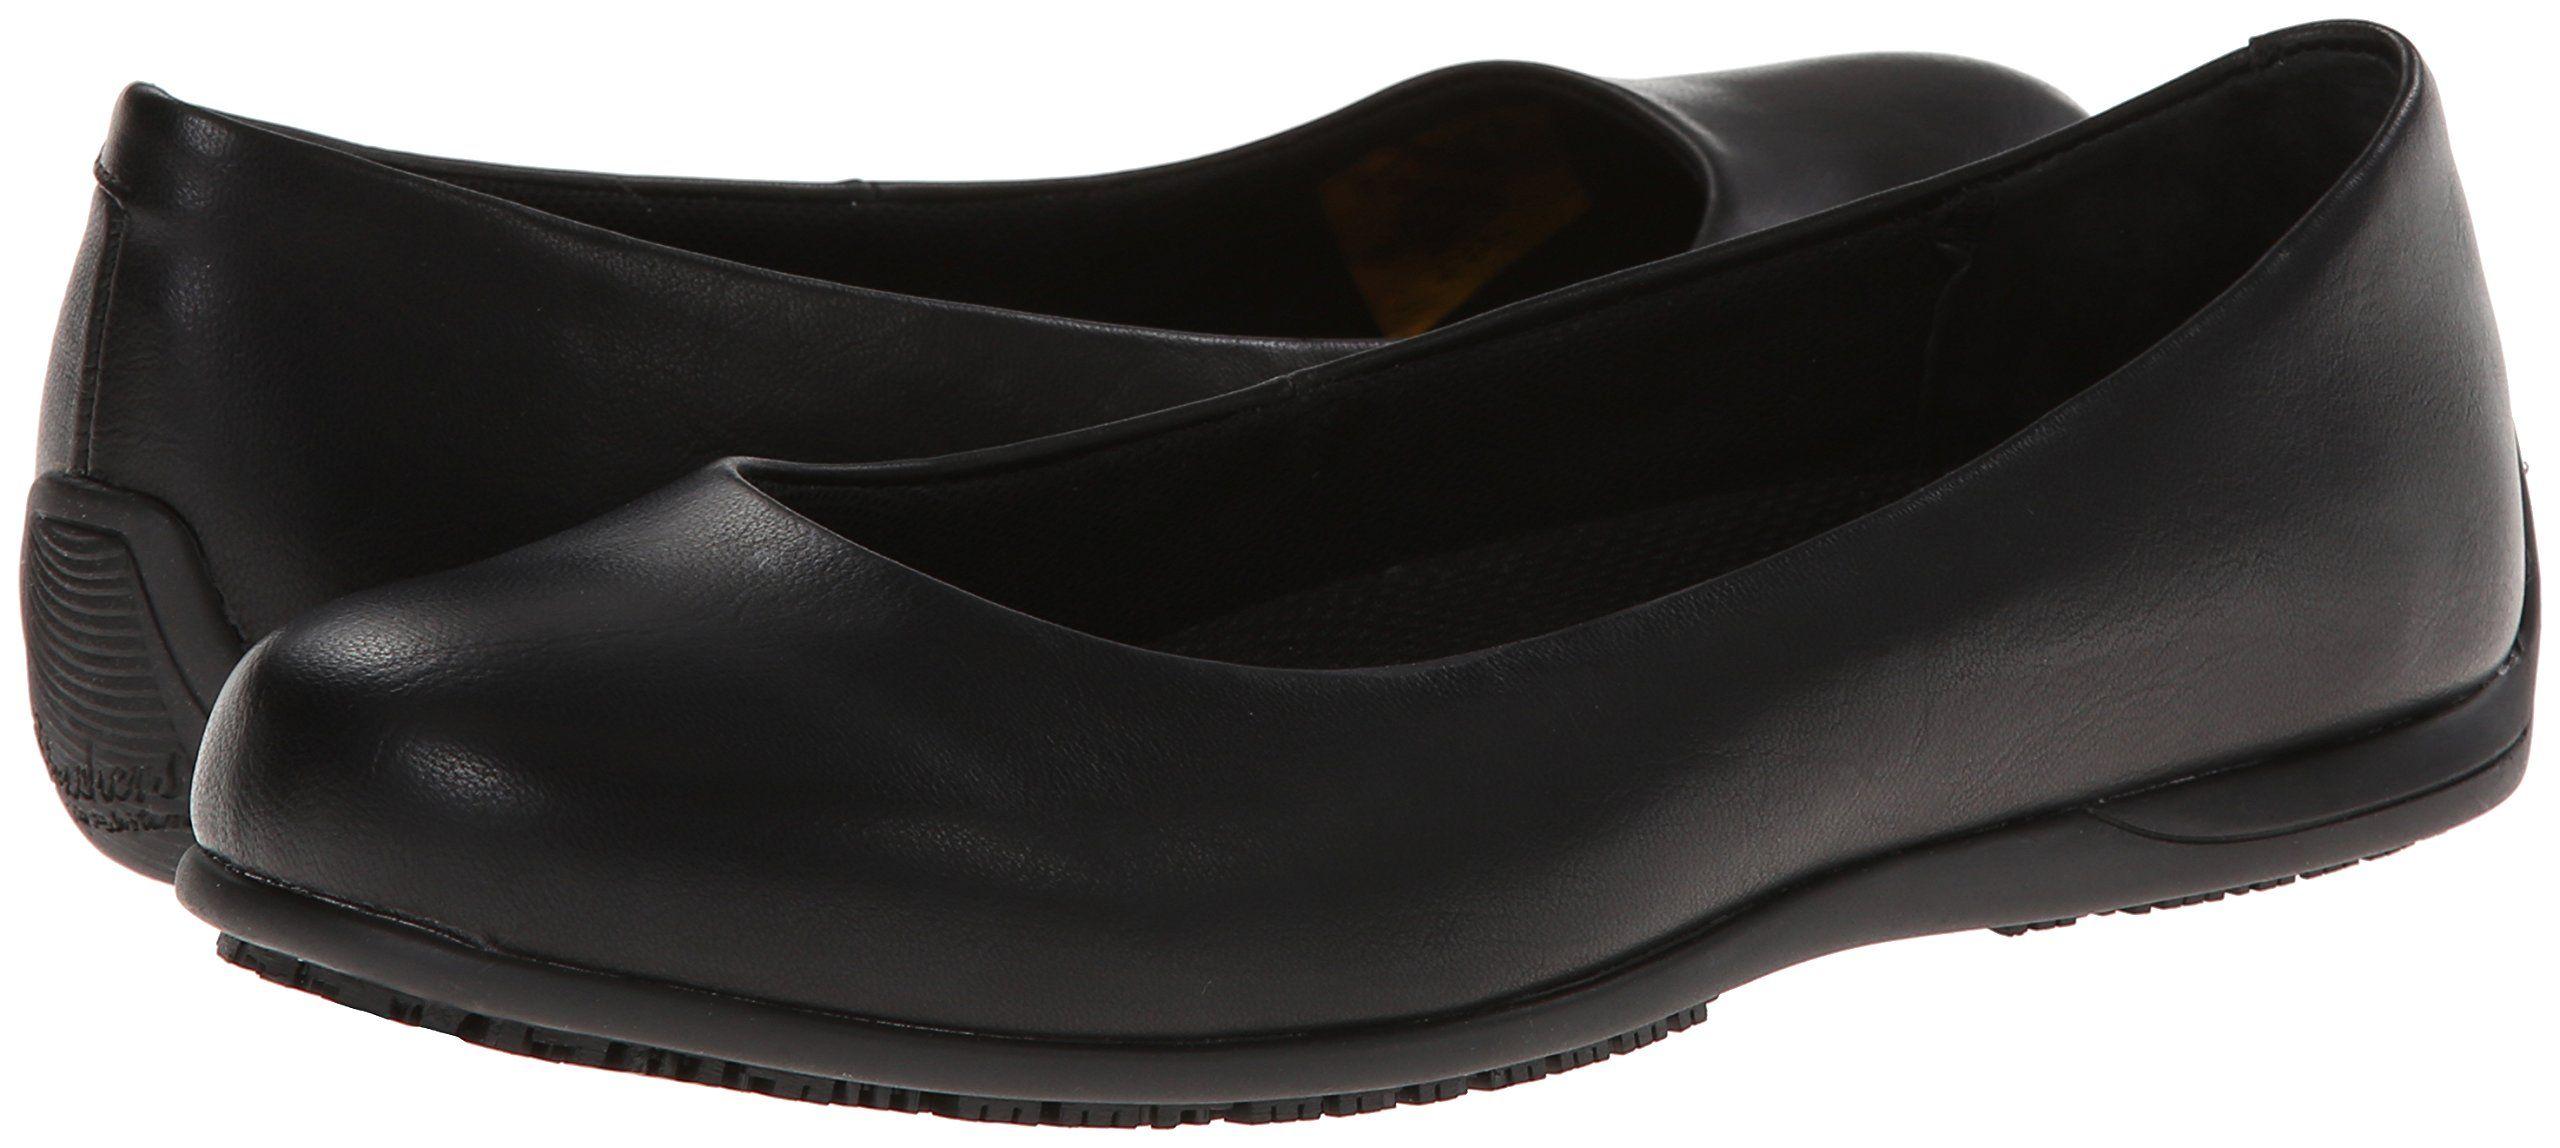 Skechers For Work Women S Flattery Transpire Work Shoe Black 8 5